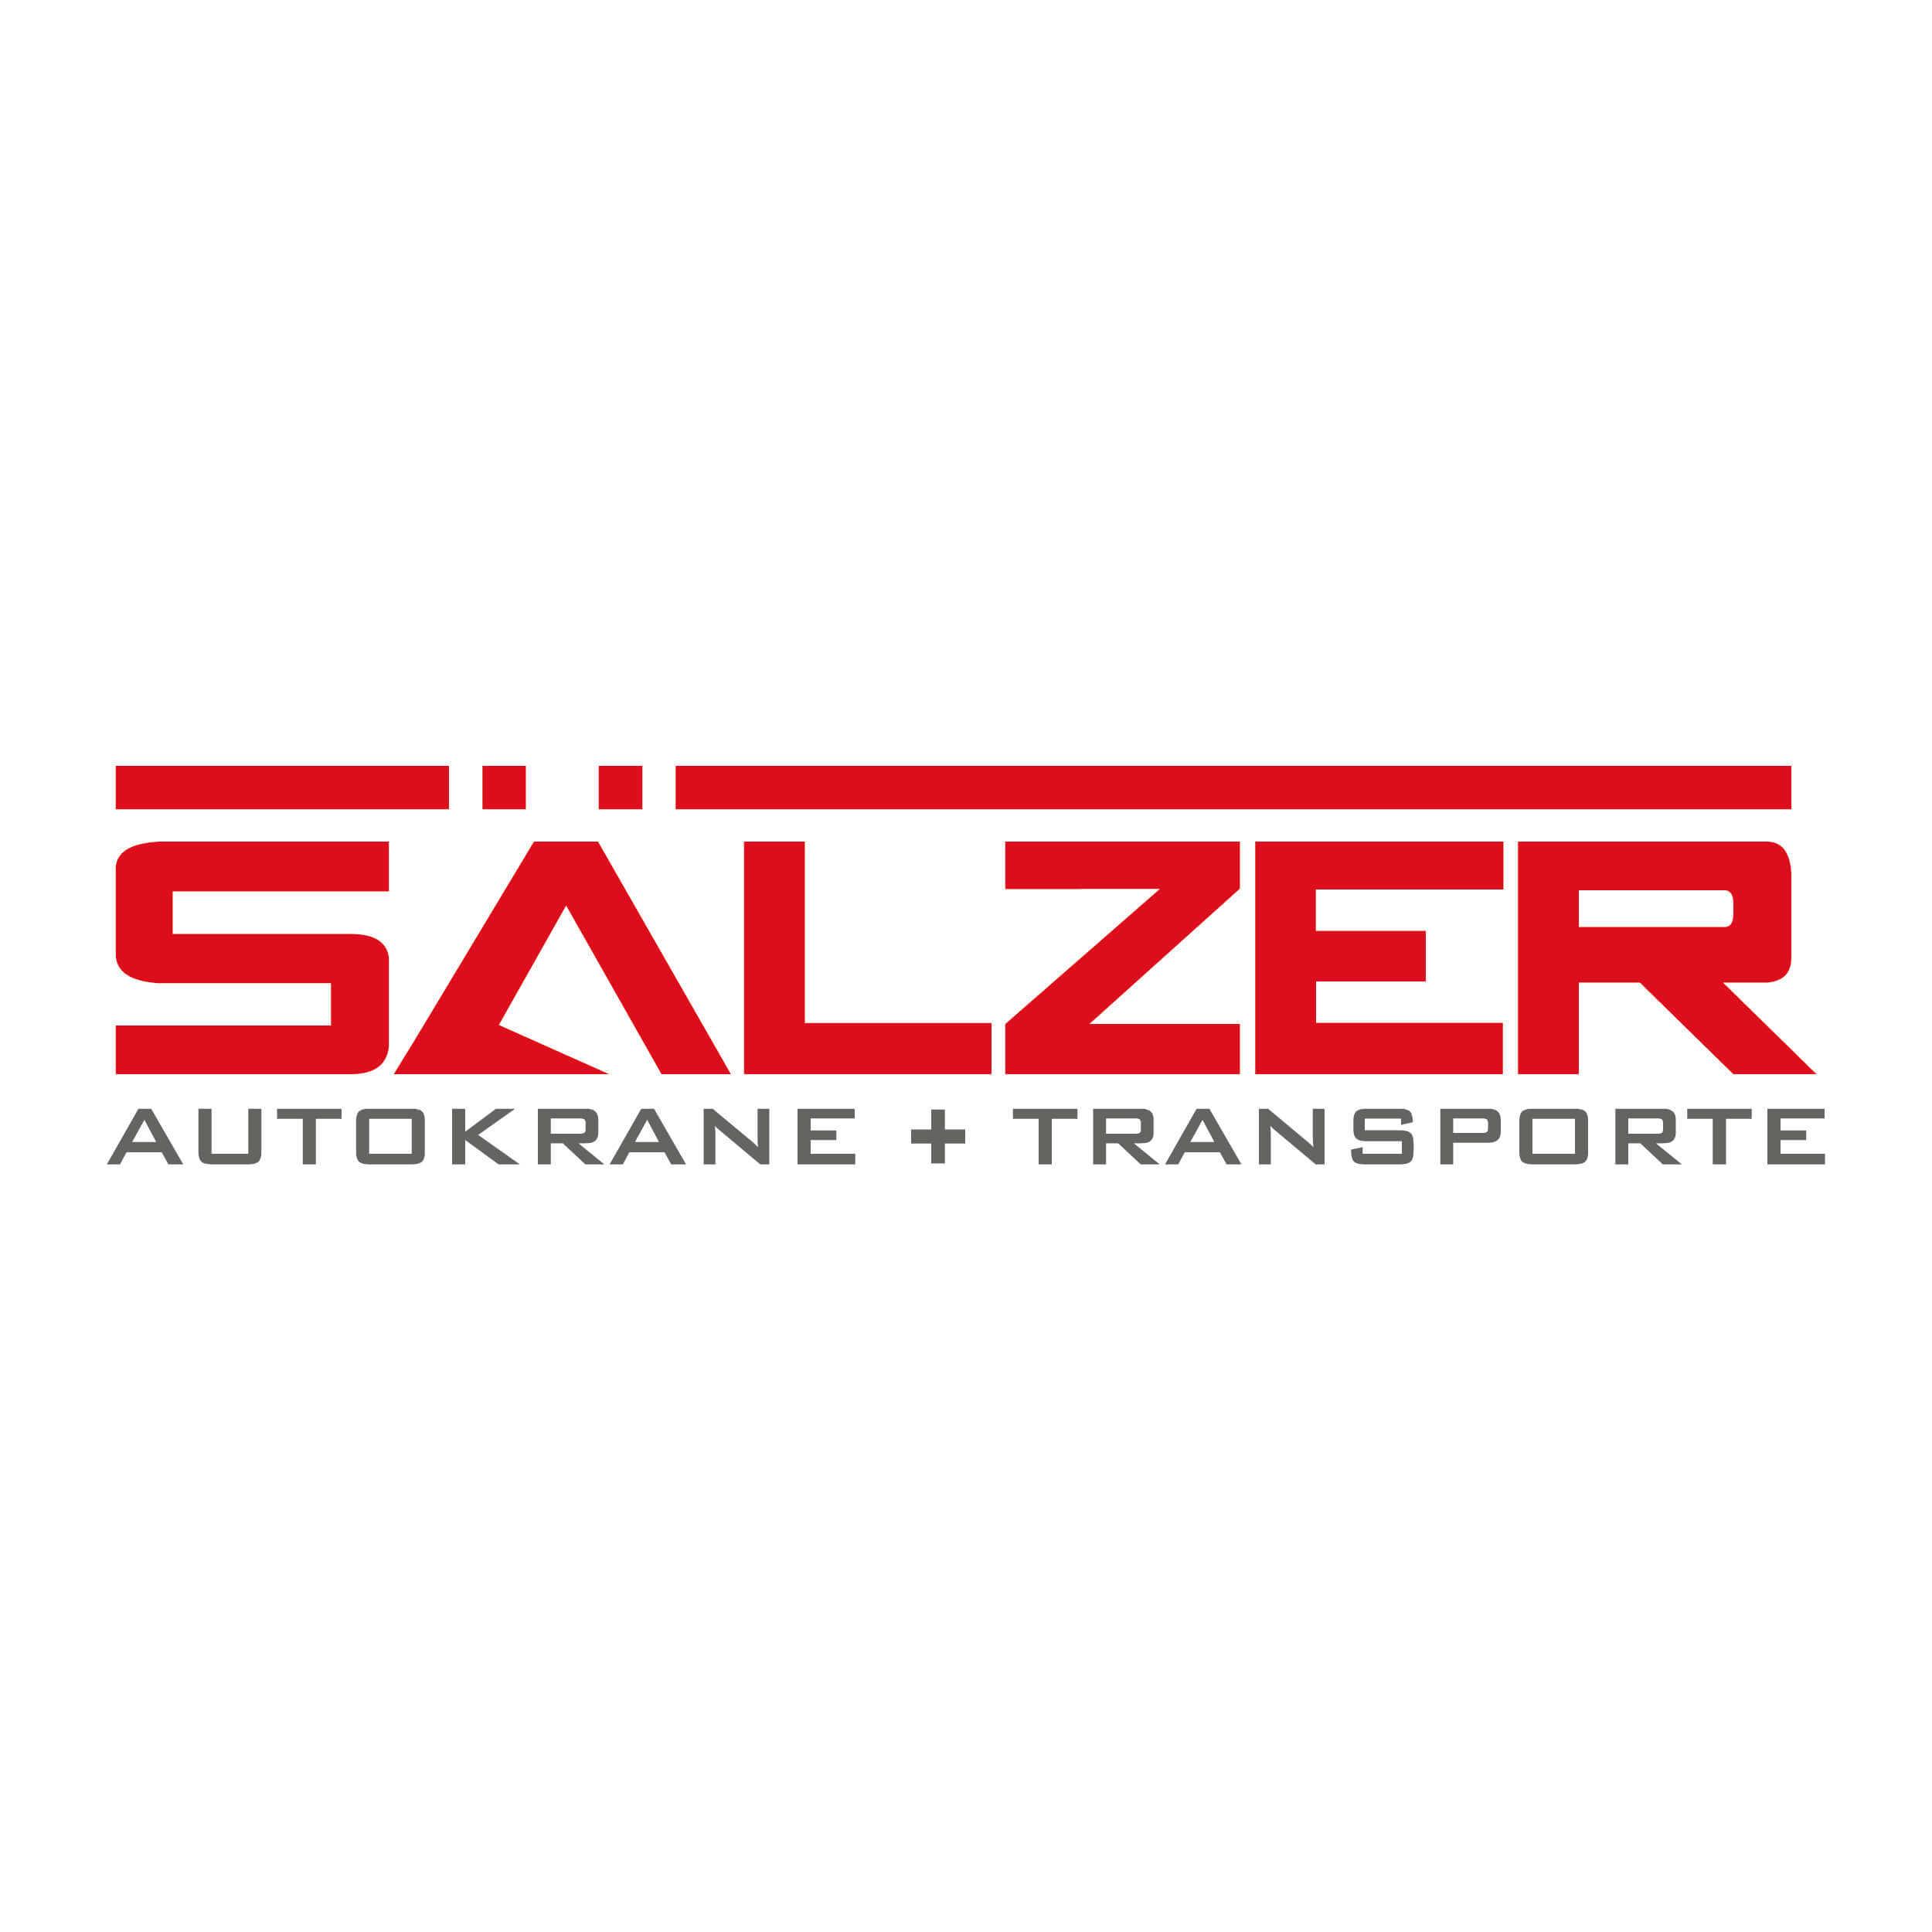 Team-Hallenmasters-17-03-2